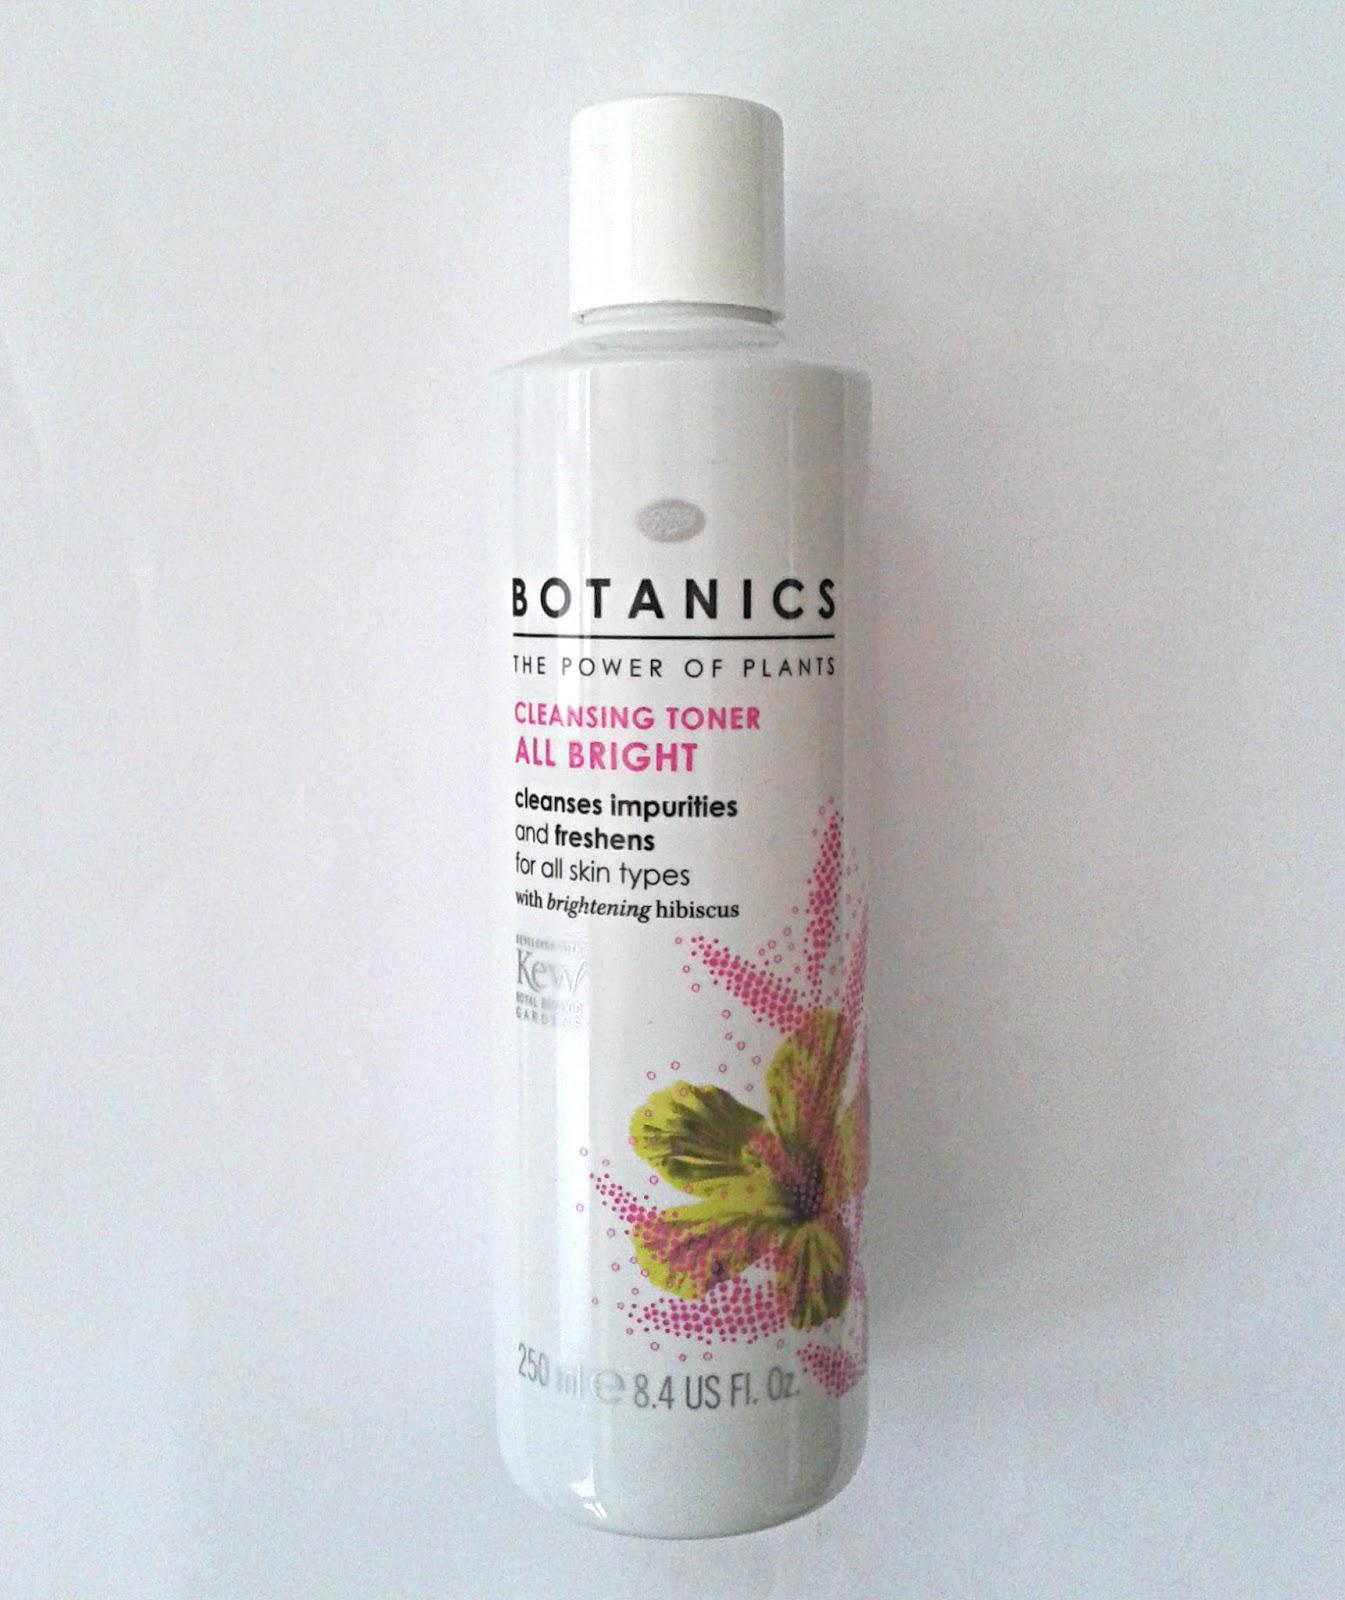 botanics cleansing toner